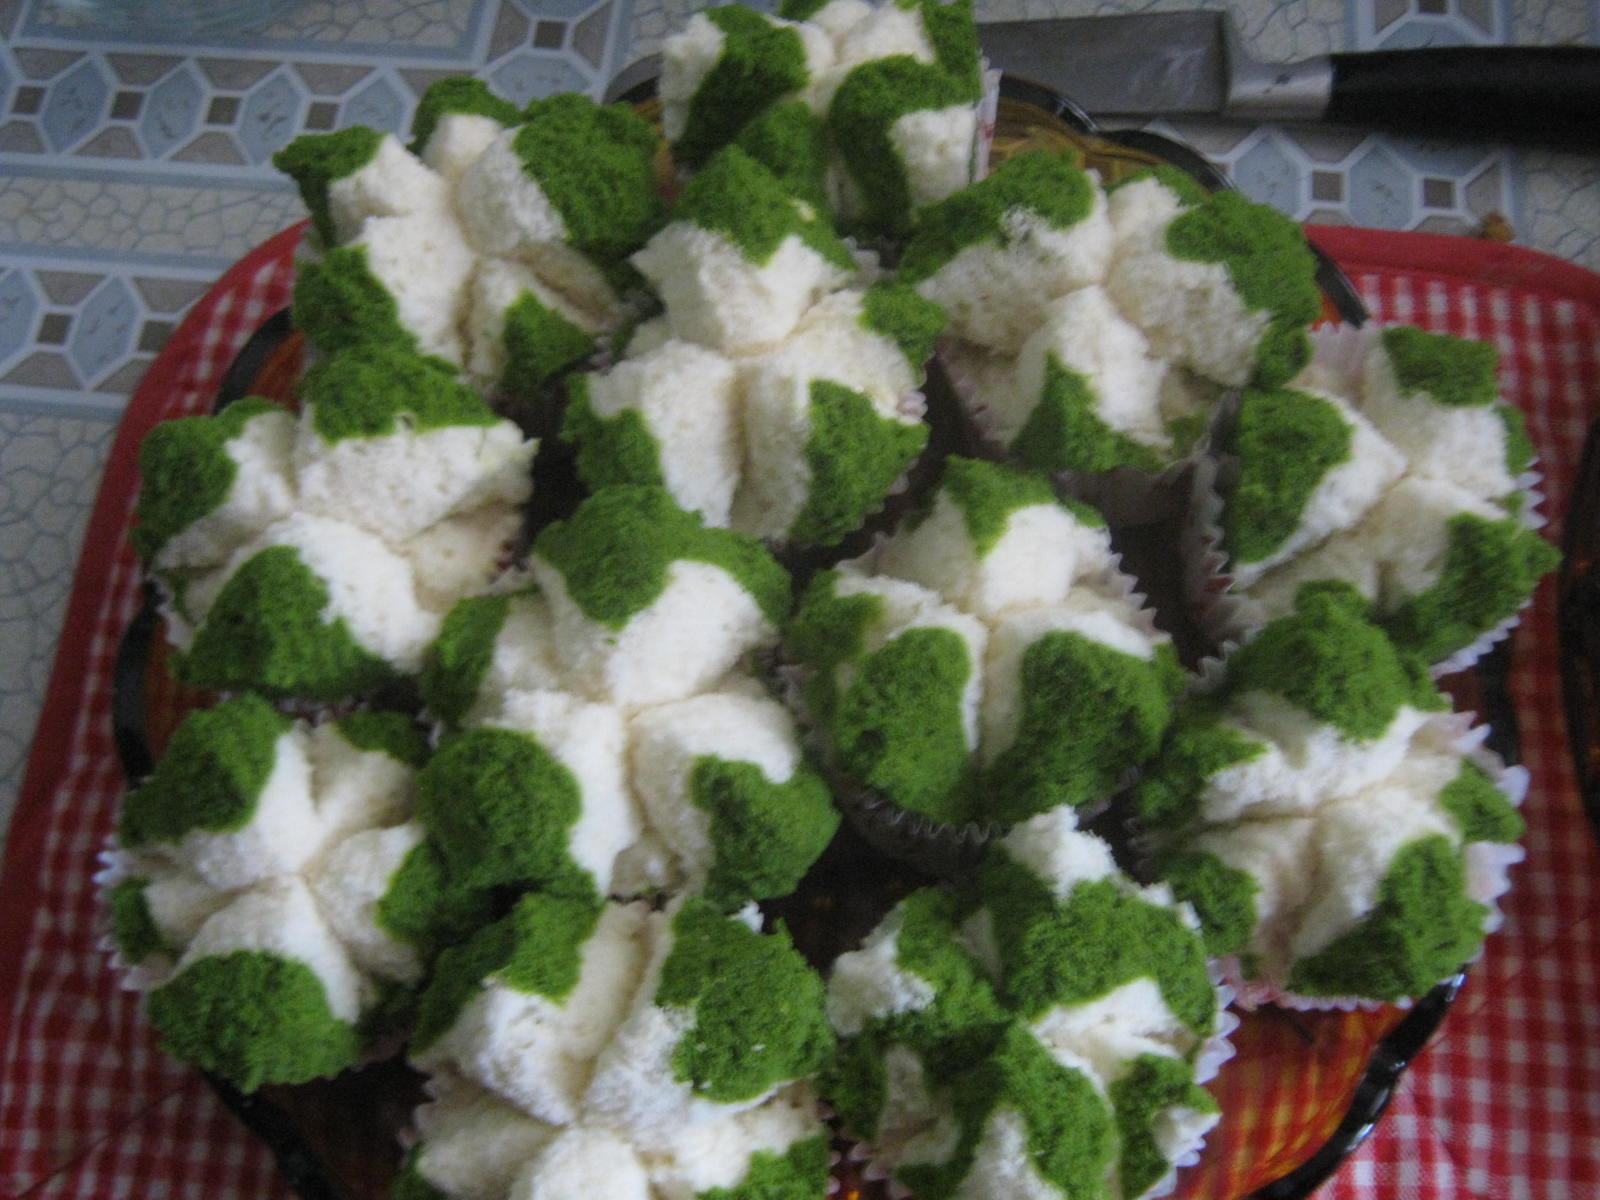 air daun suji untuk roti kukus bunda. Disamping warnanya yang hijau ...